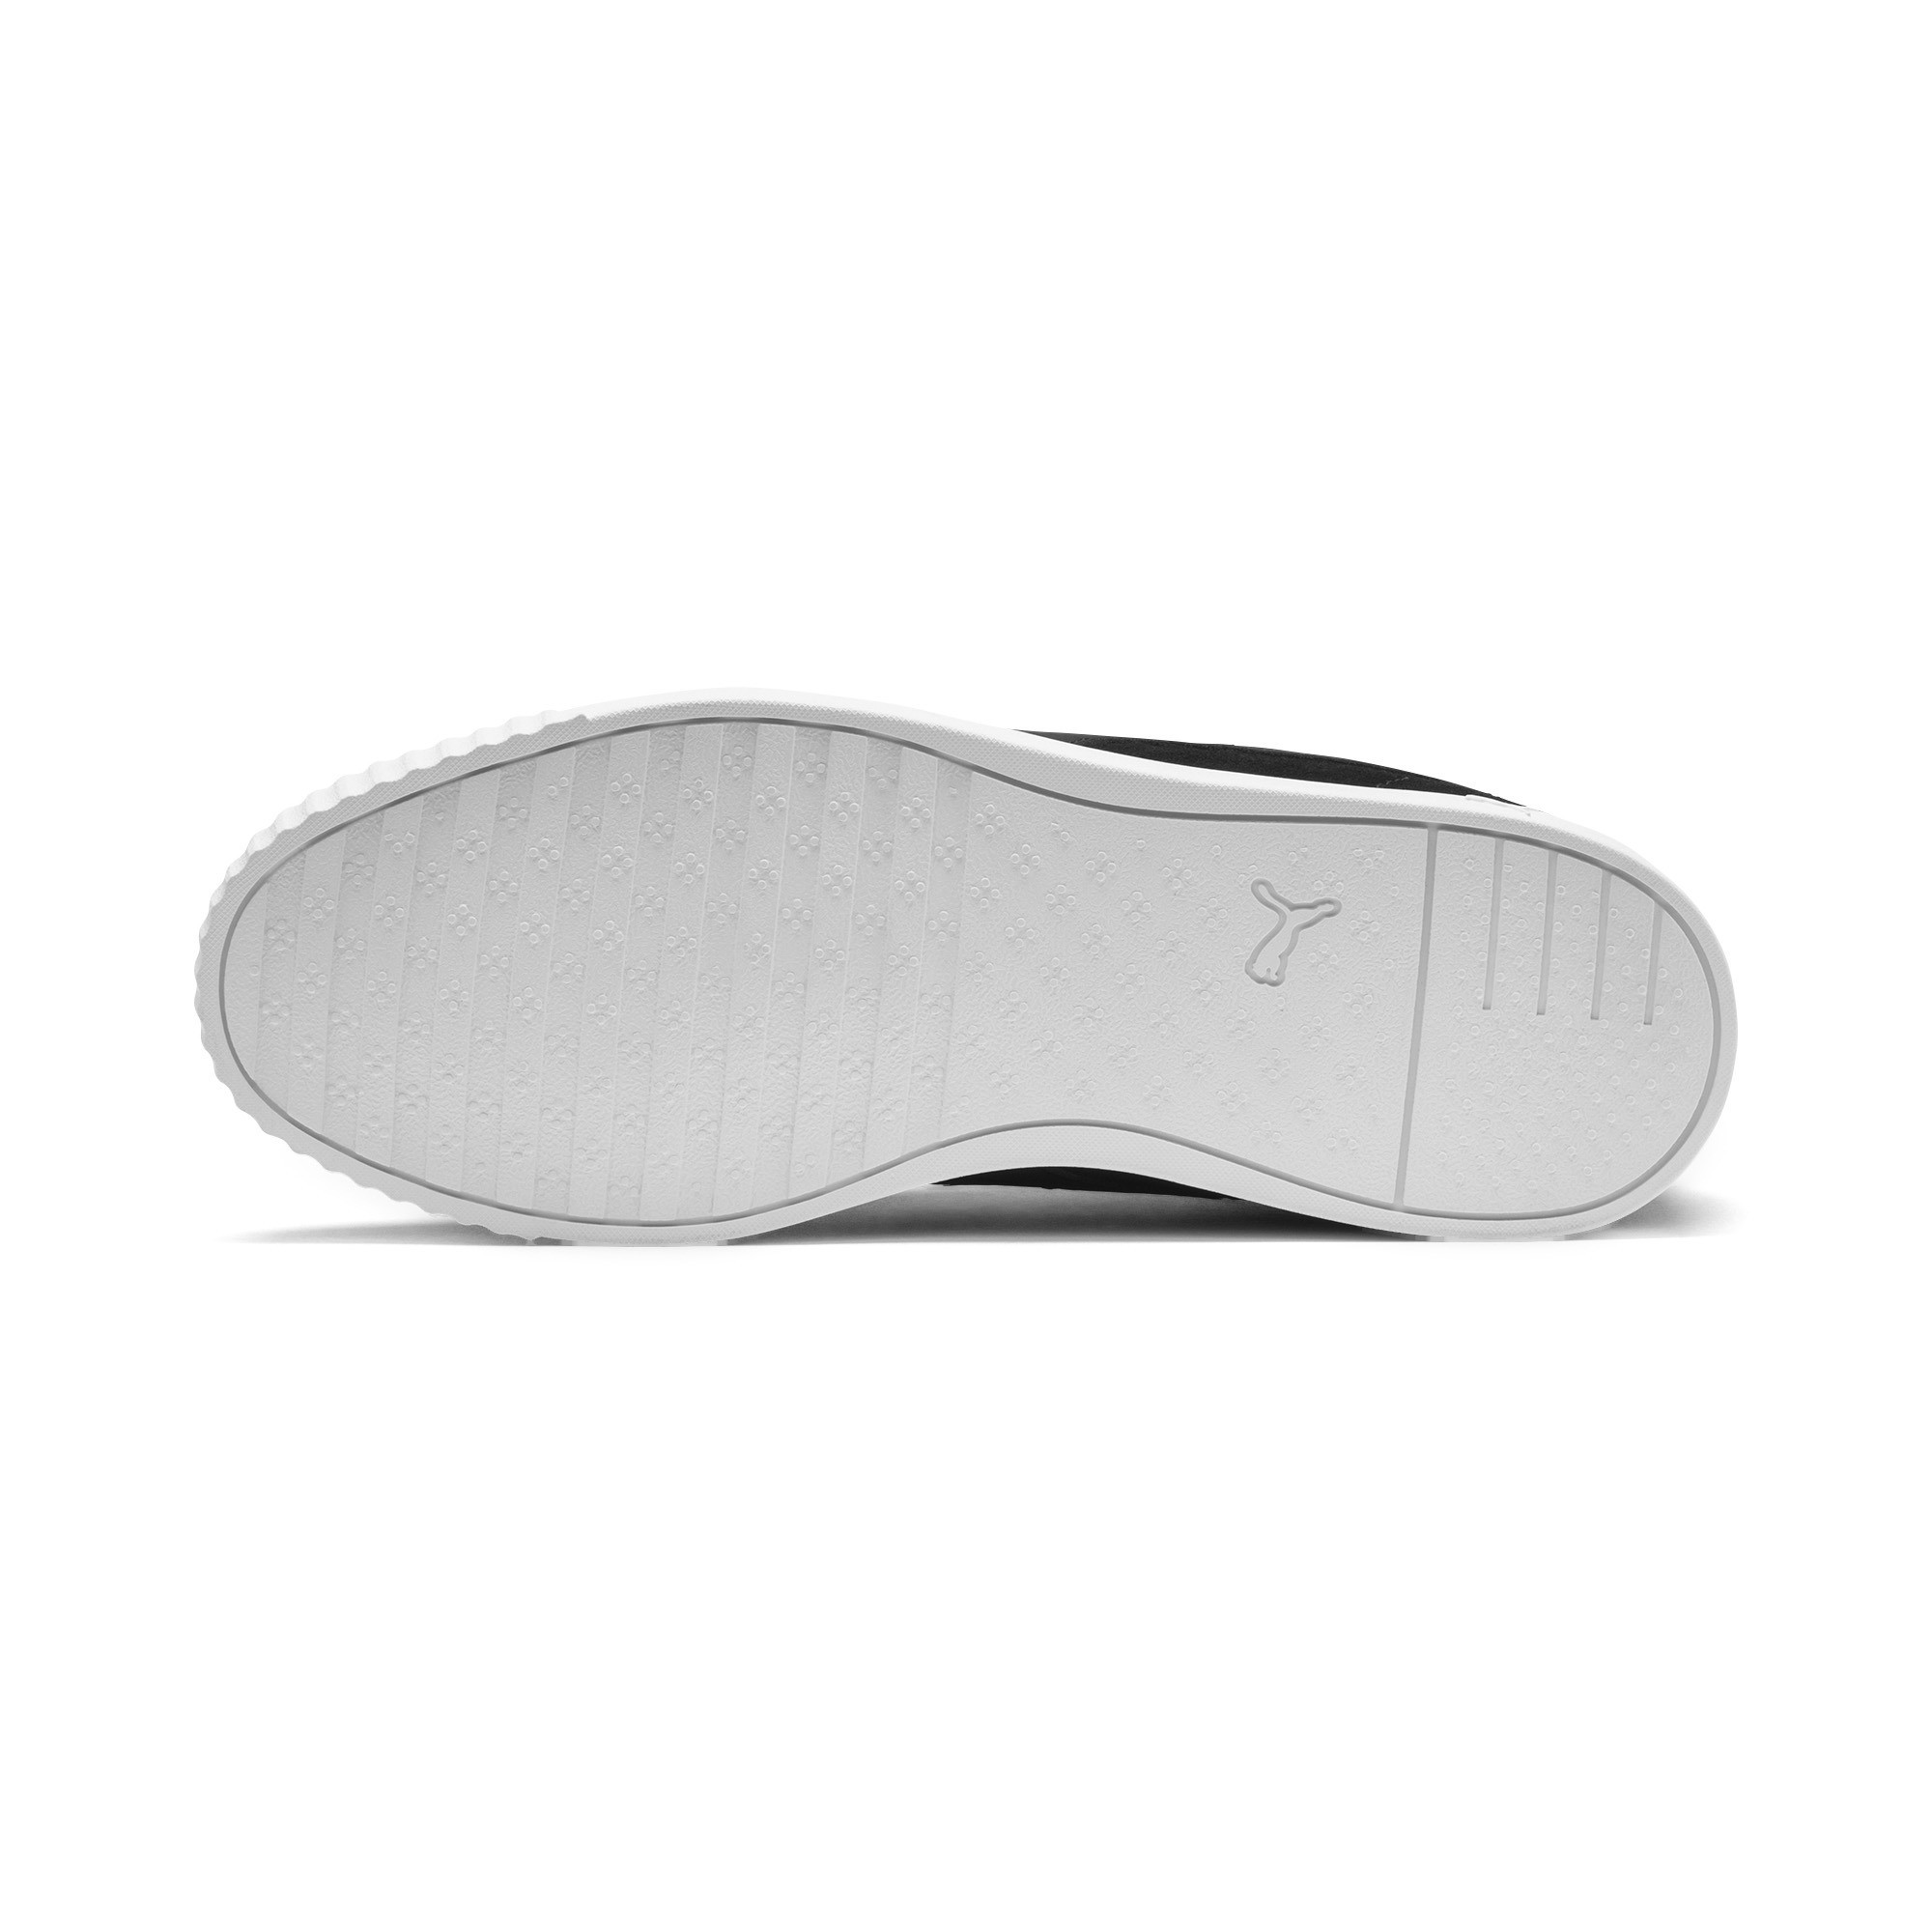 PUMA-Women-039-s-Carina-Slim-Suede-Sneakers thumbnail 20